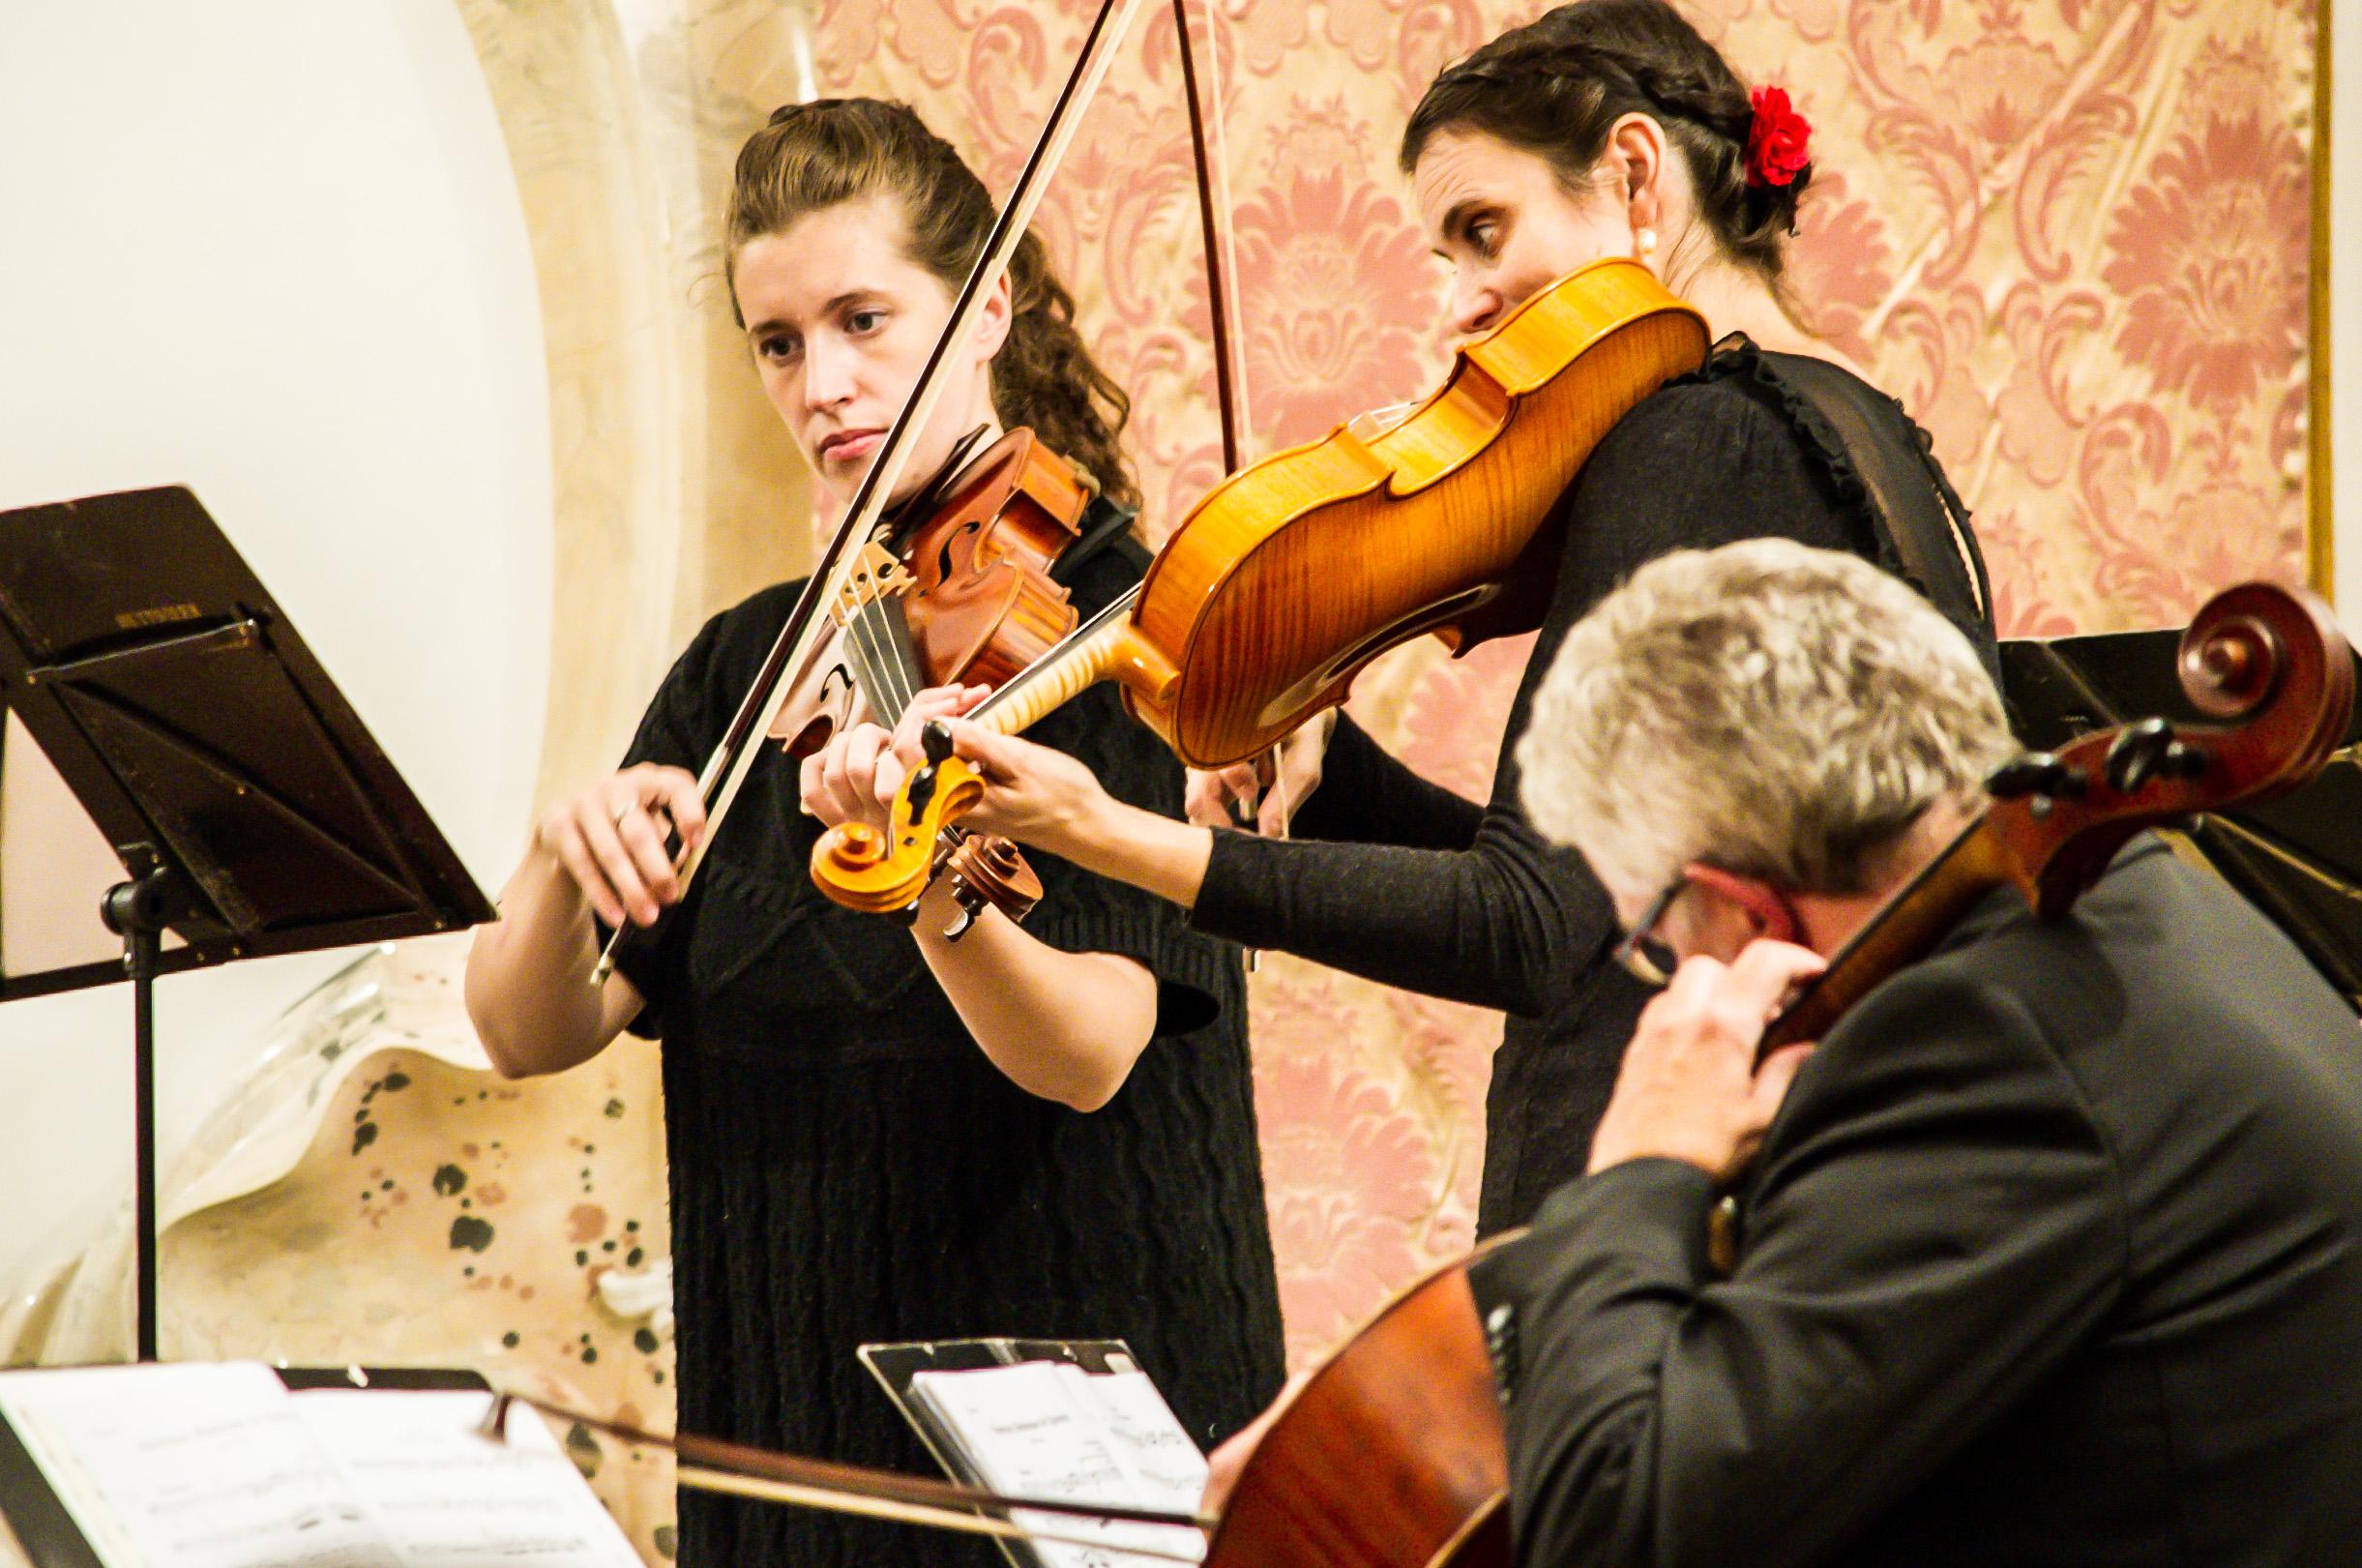 17_09_Herbstkonzert Kammerorchester Huttwil_BO-45